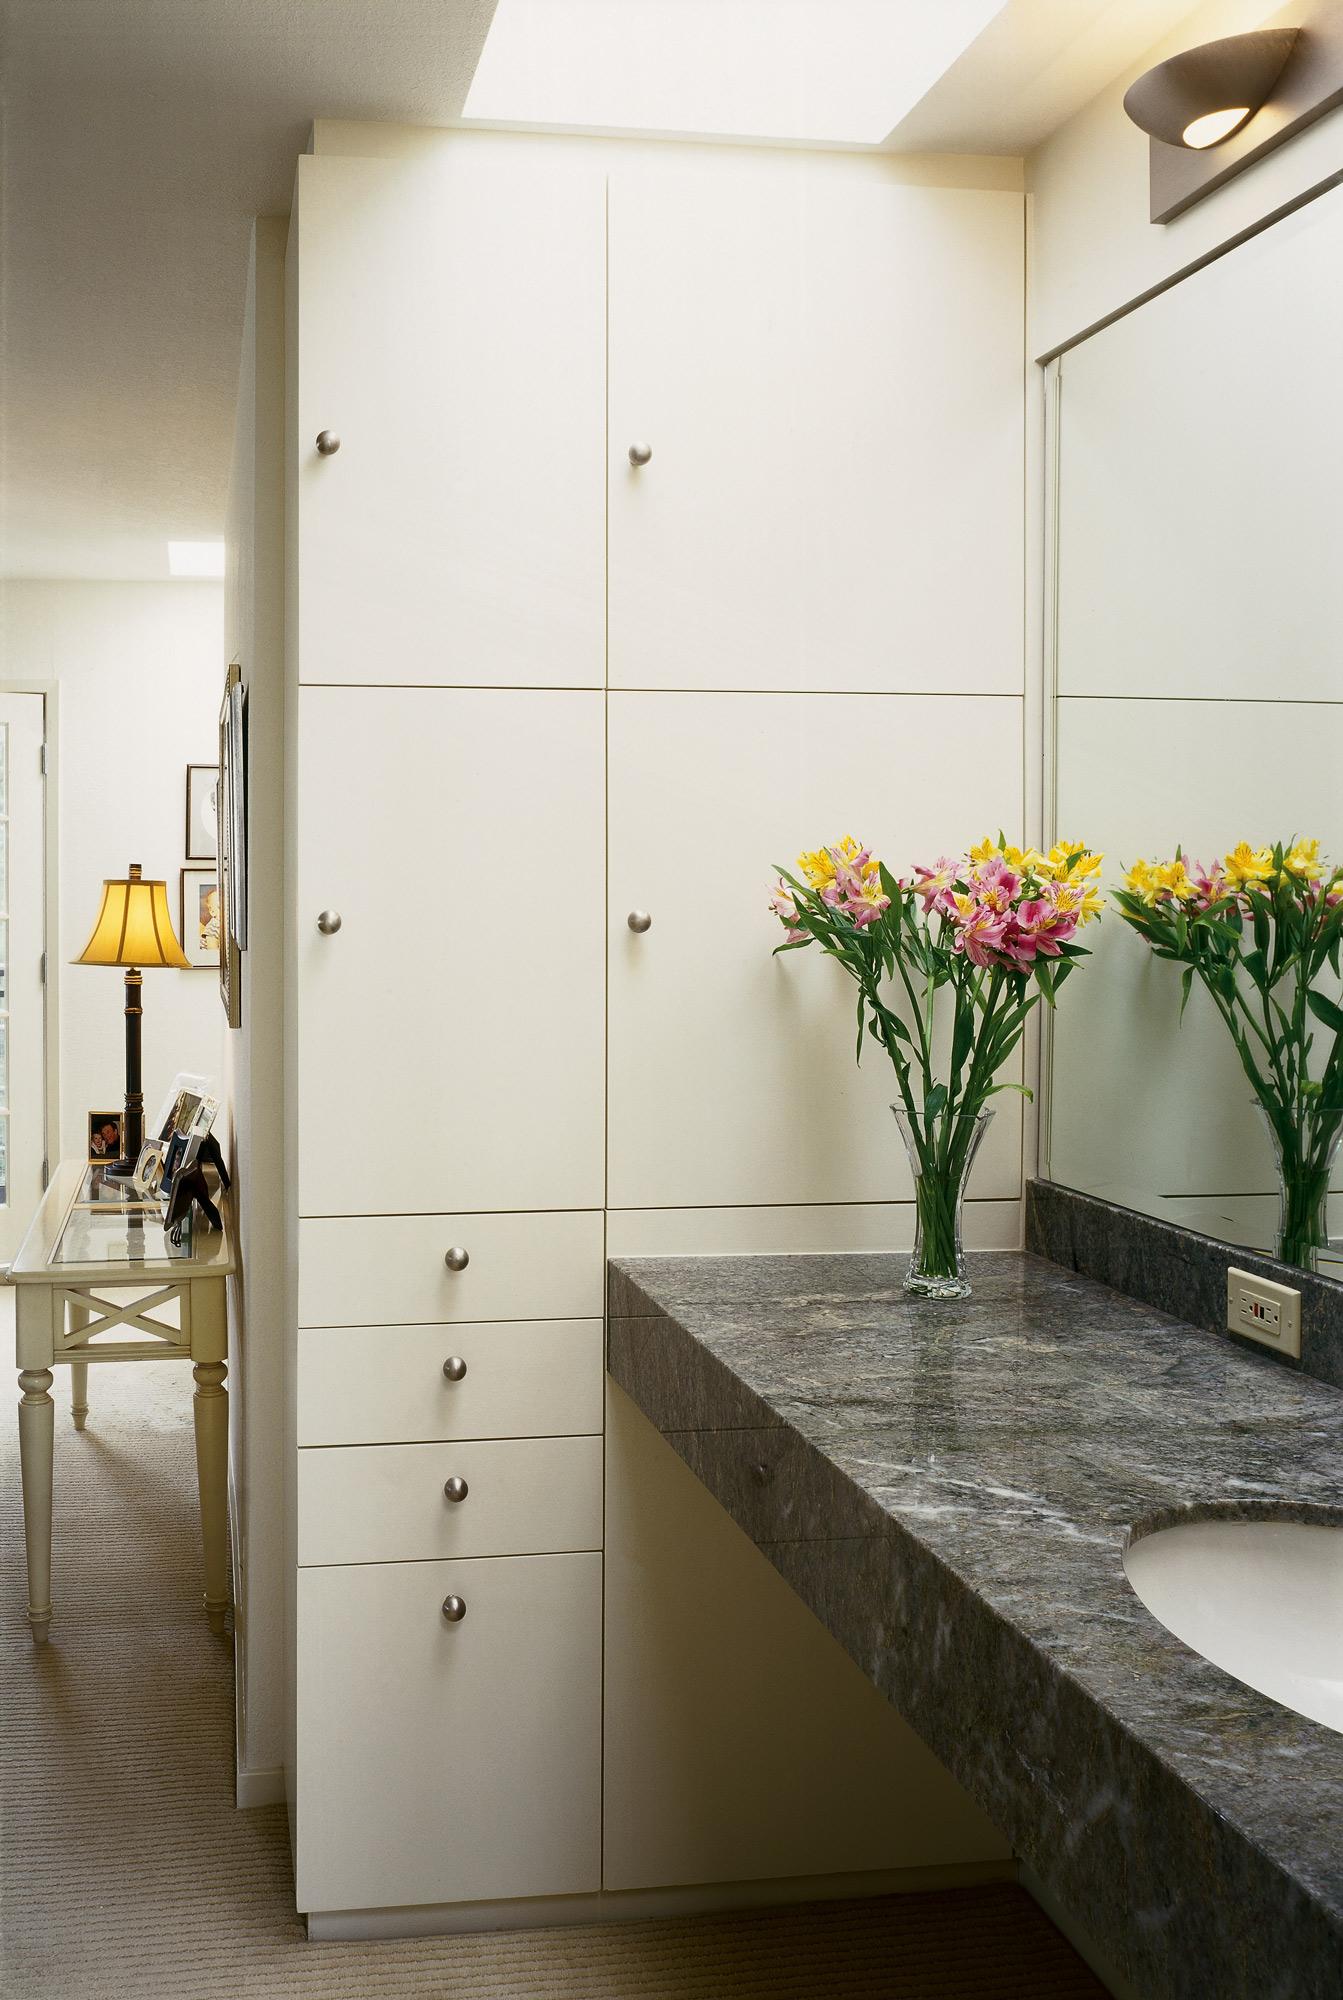 Kaplan-Architects-San Francisco-master-bath-remodel-vanity-storage.jpg